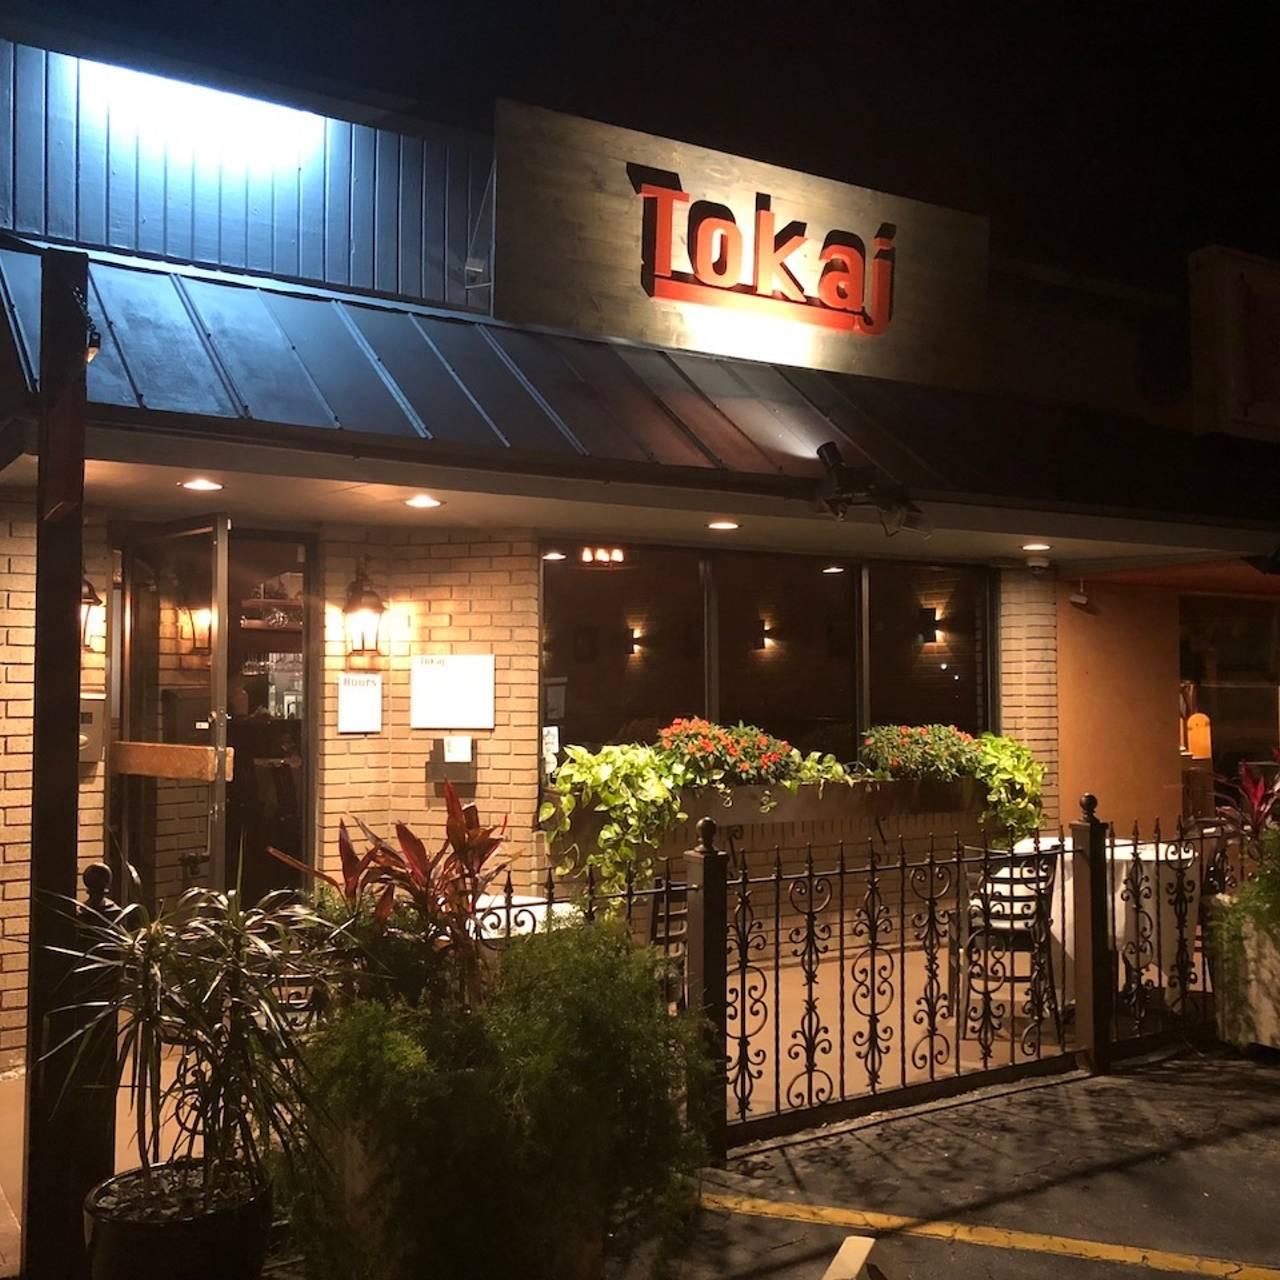 Tokaj Restaurant - Sarasota, FL   OpenTable